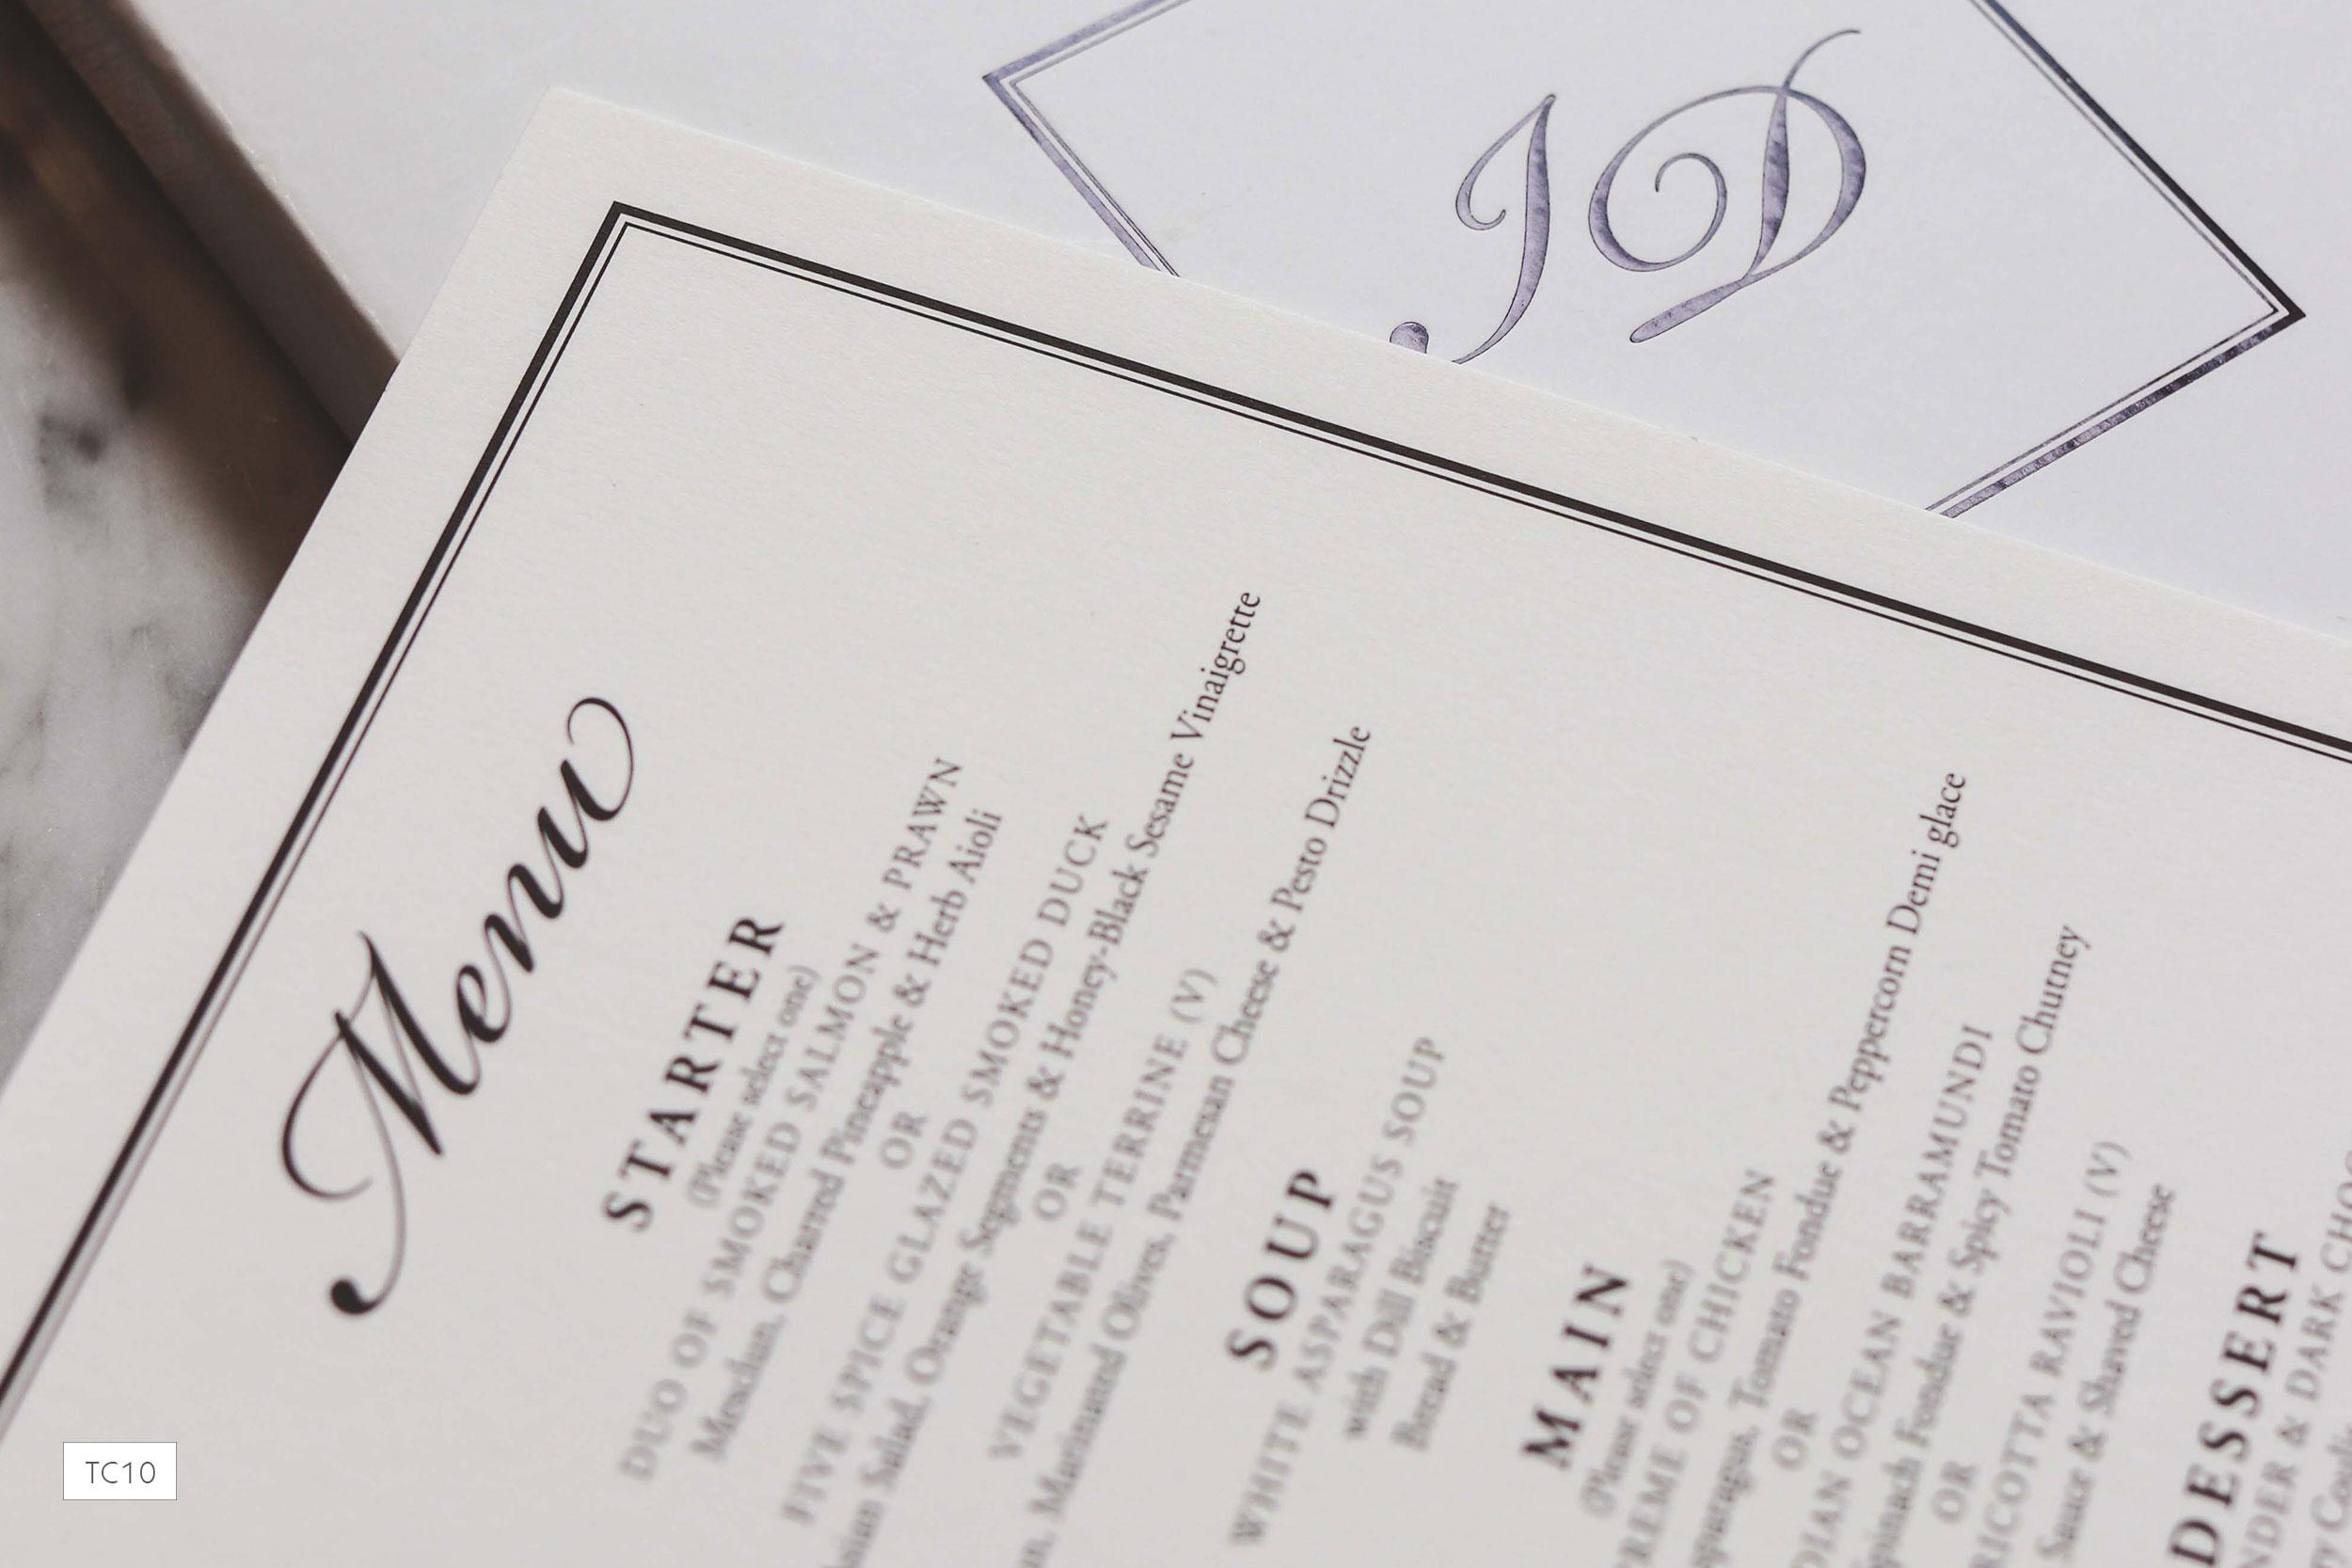 tc10-monochrome-wedding-invitation.jpg